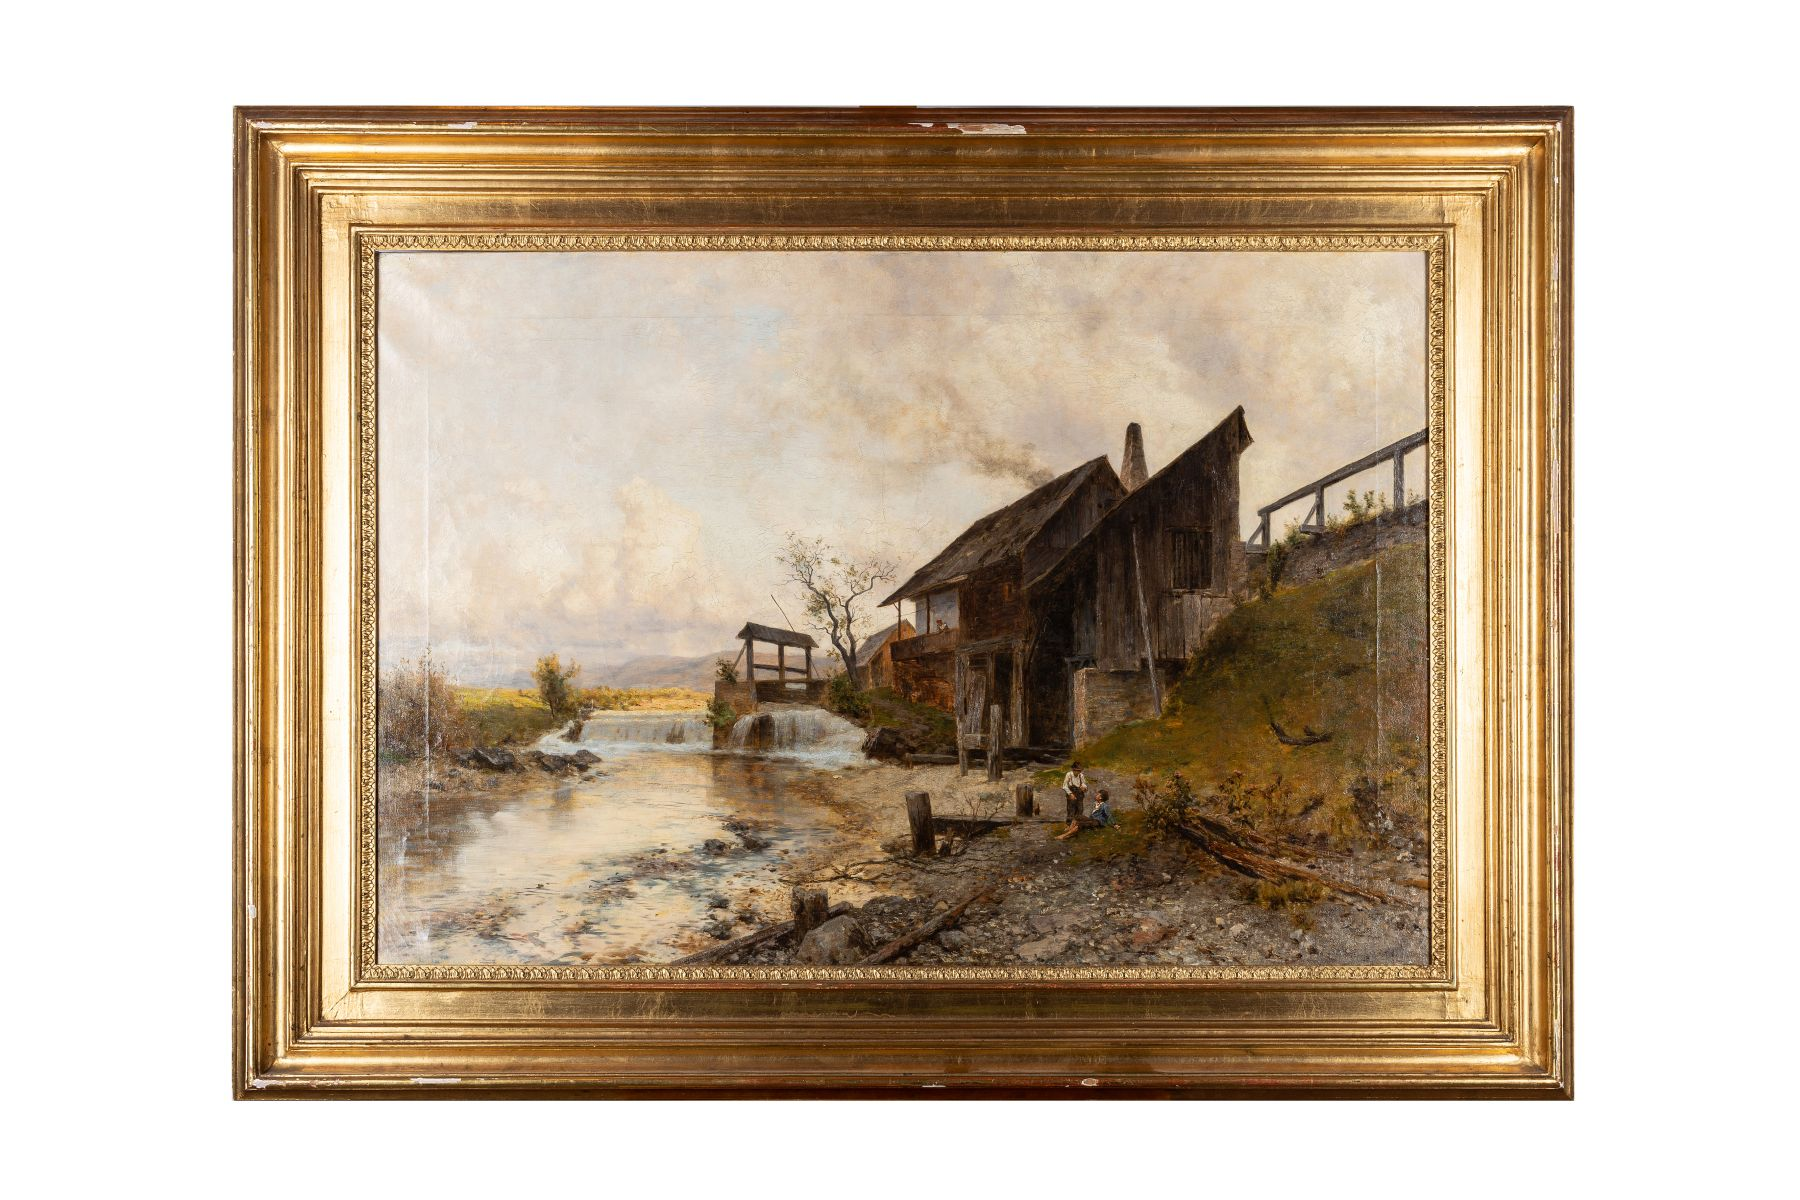 "#118 Max Suppantschitsch (1845-1953), ""Boys at the Mill"" | Max Suppantschitsch (1845-1953), ""Knaben an der Mühle"" Image"